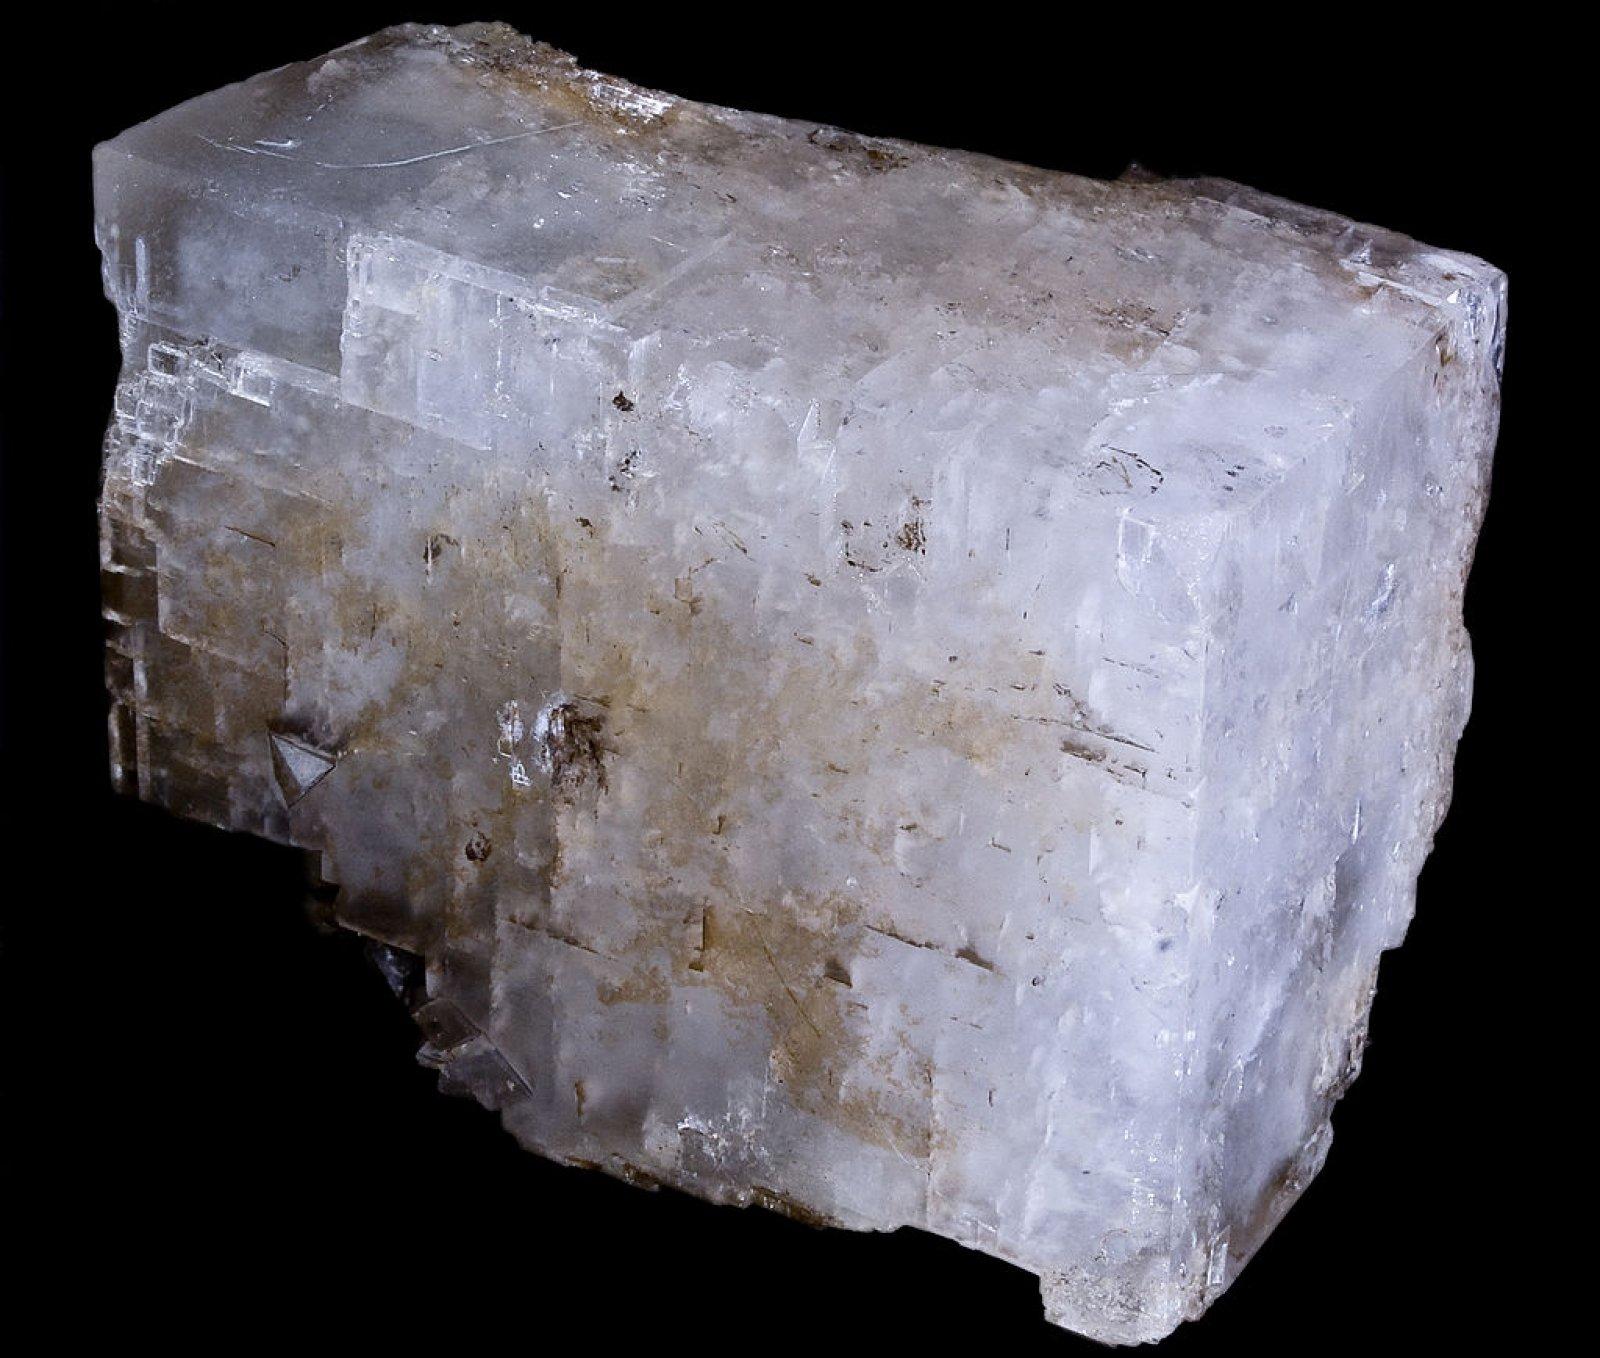 Pedra de magnesita, (MgCO3)